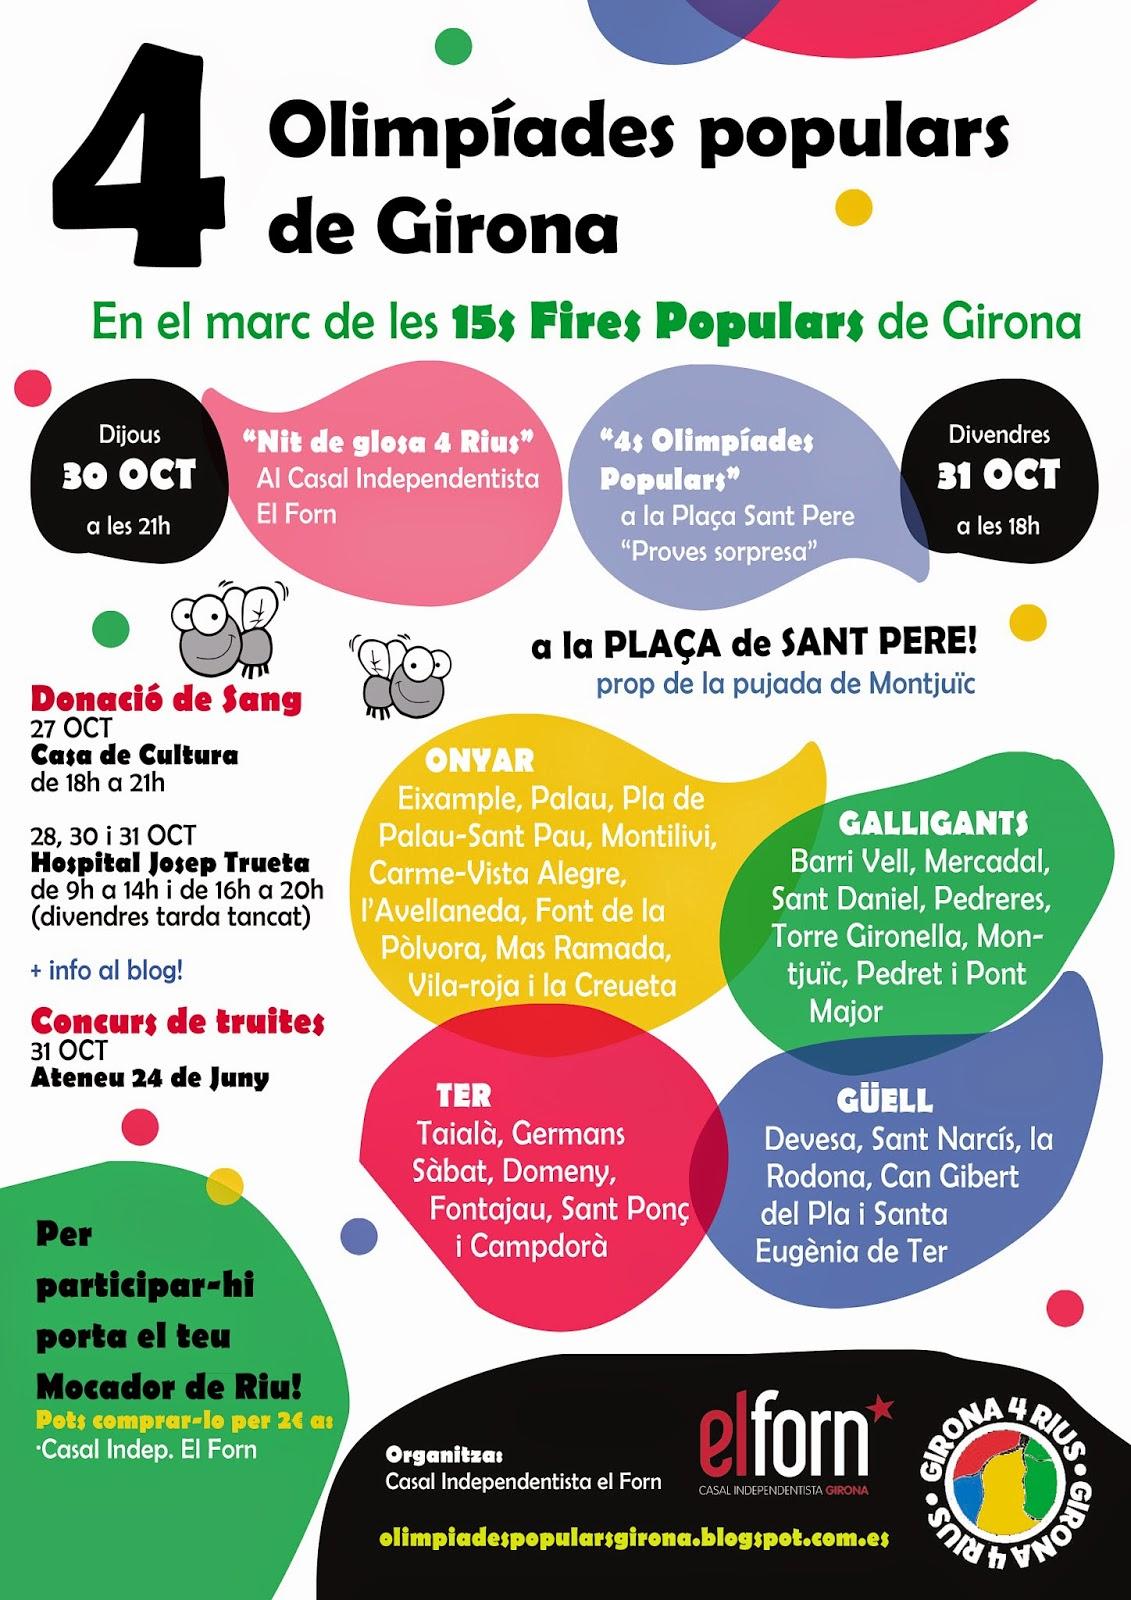 15 Fires populars Girona